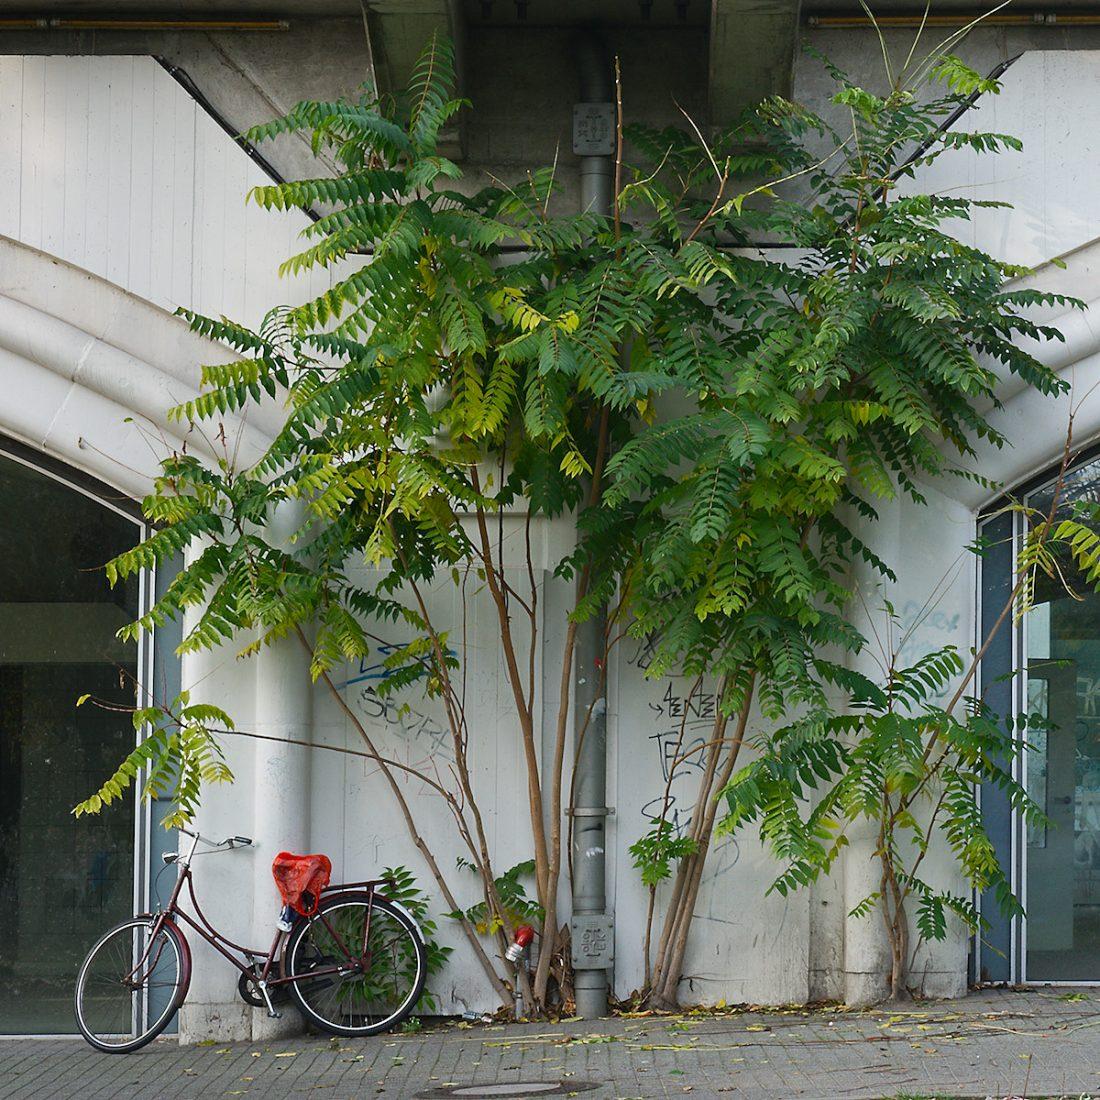 Bike and Sumach: Urban, Vernacular